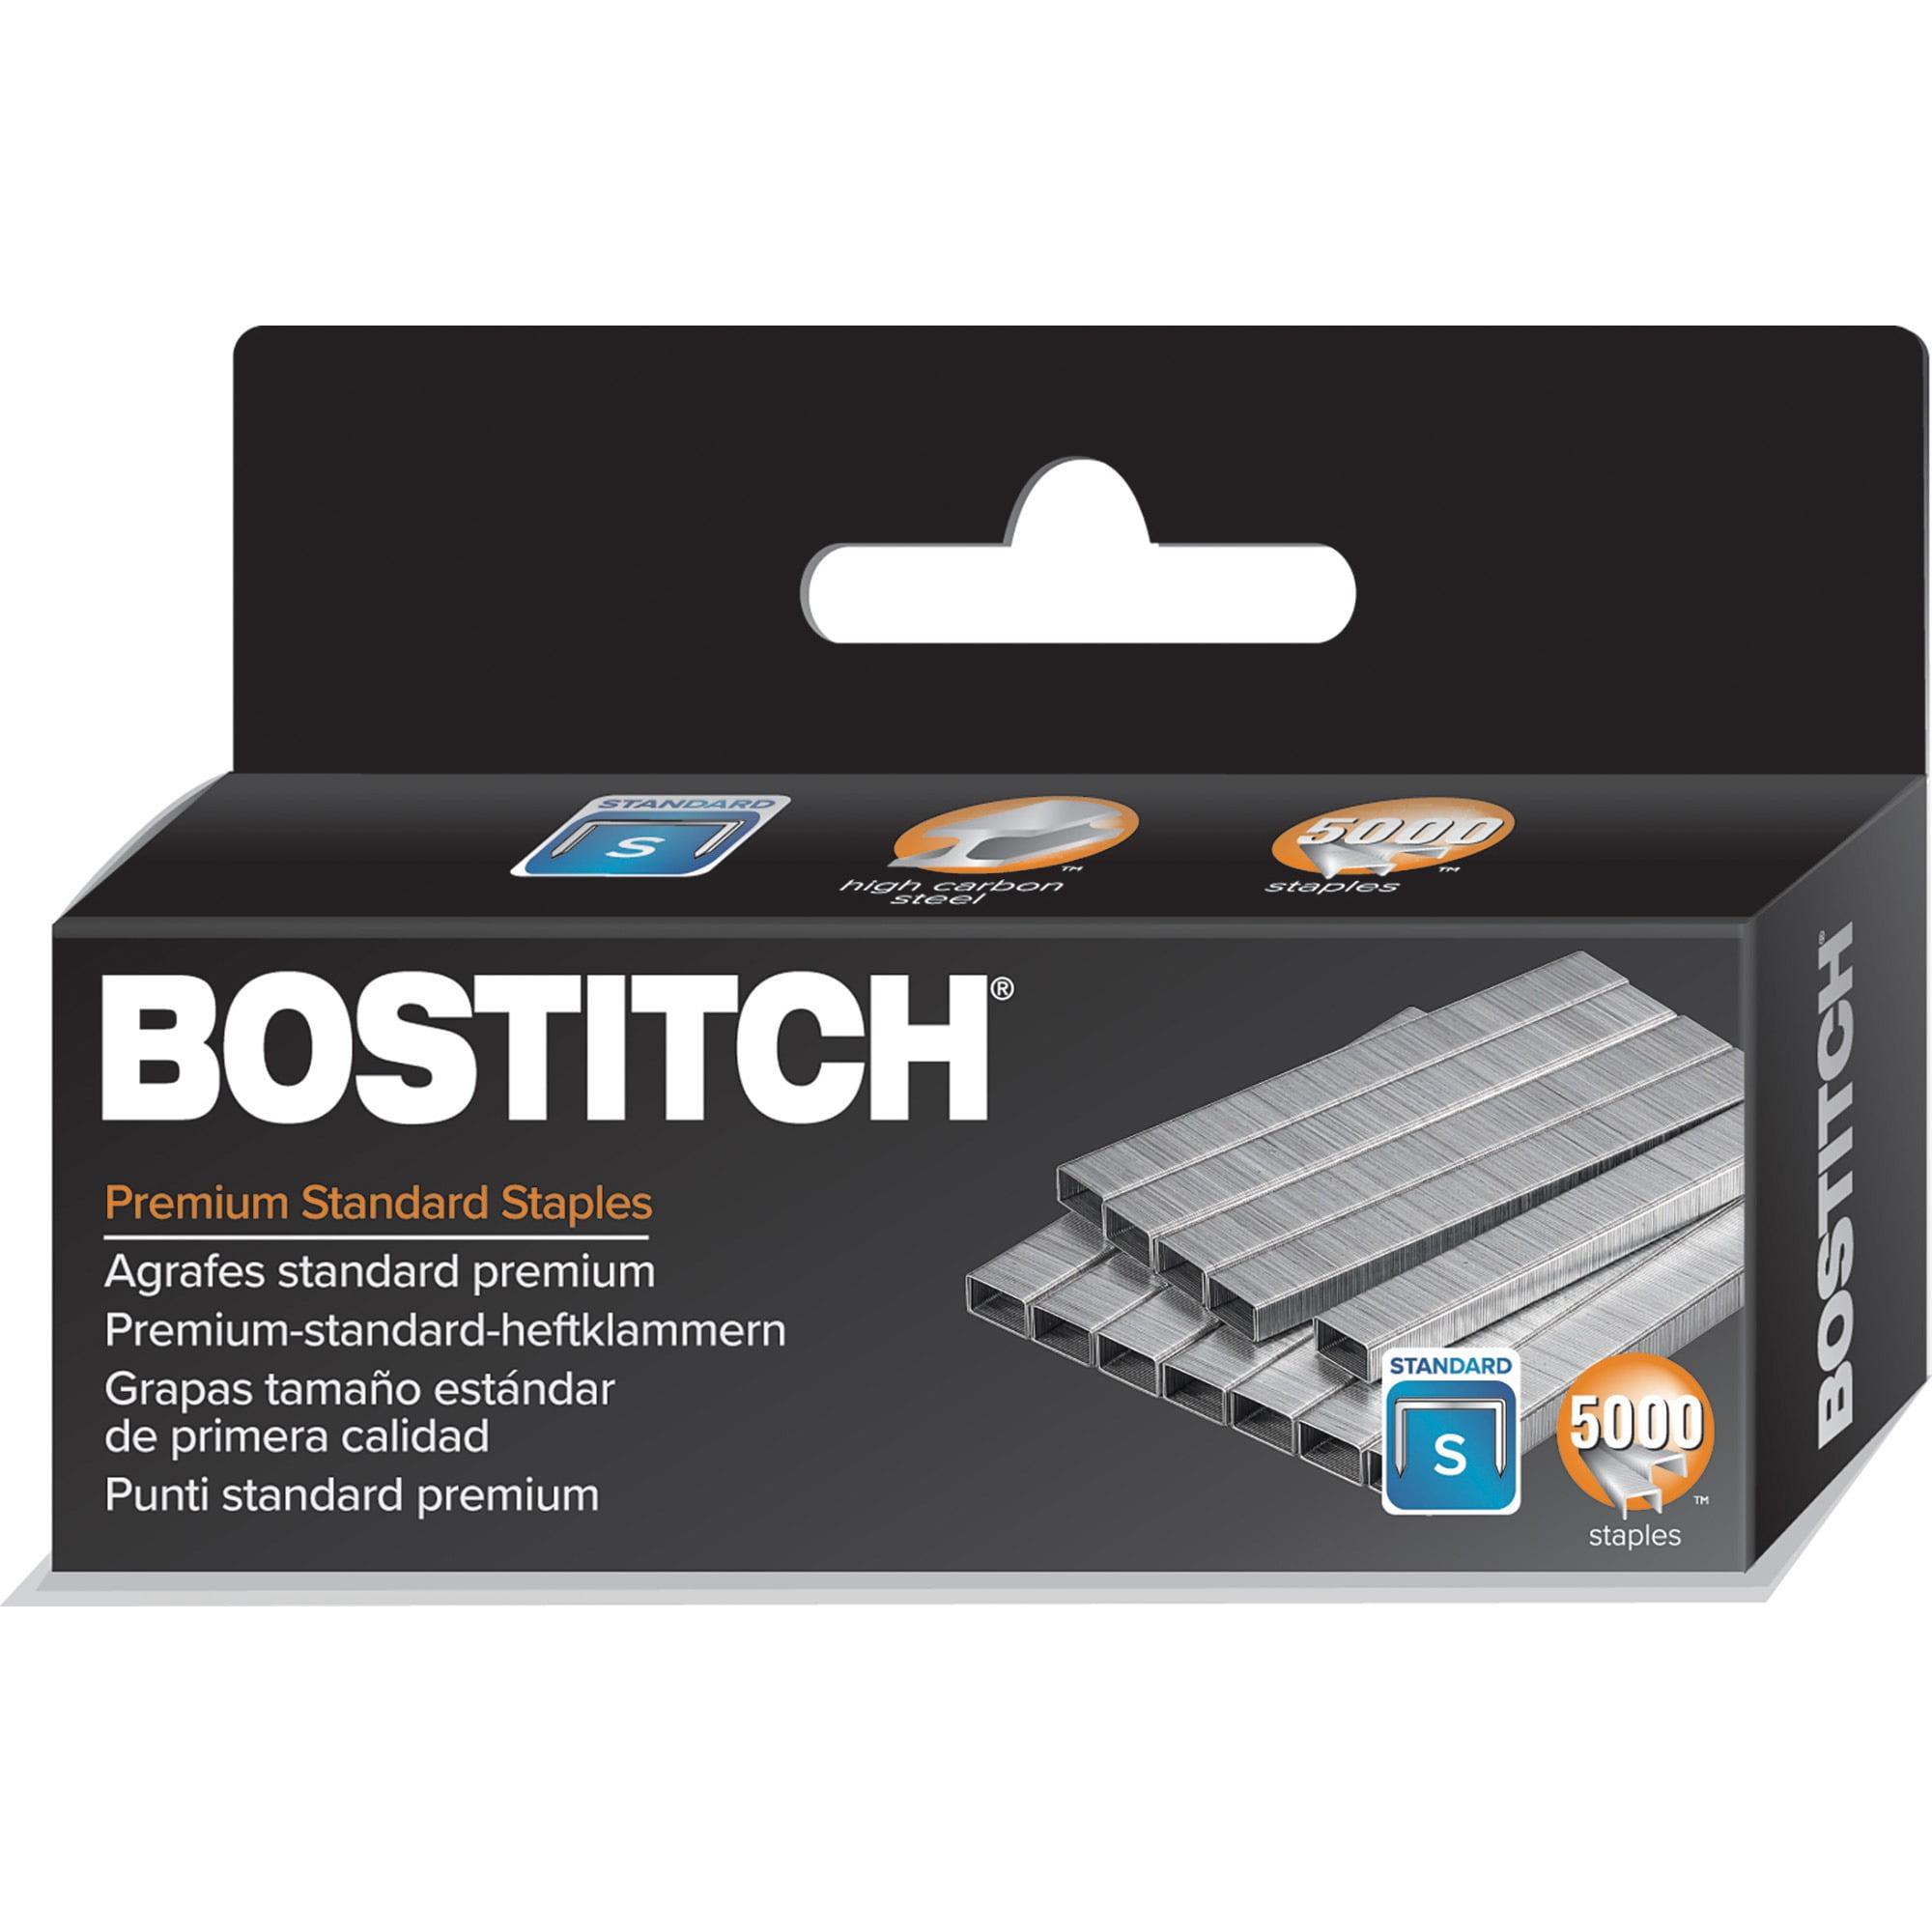 PaperPro Full Strip Standard Office Staples, 5000/Box